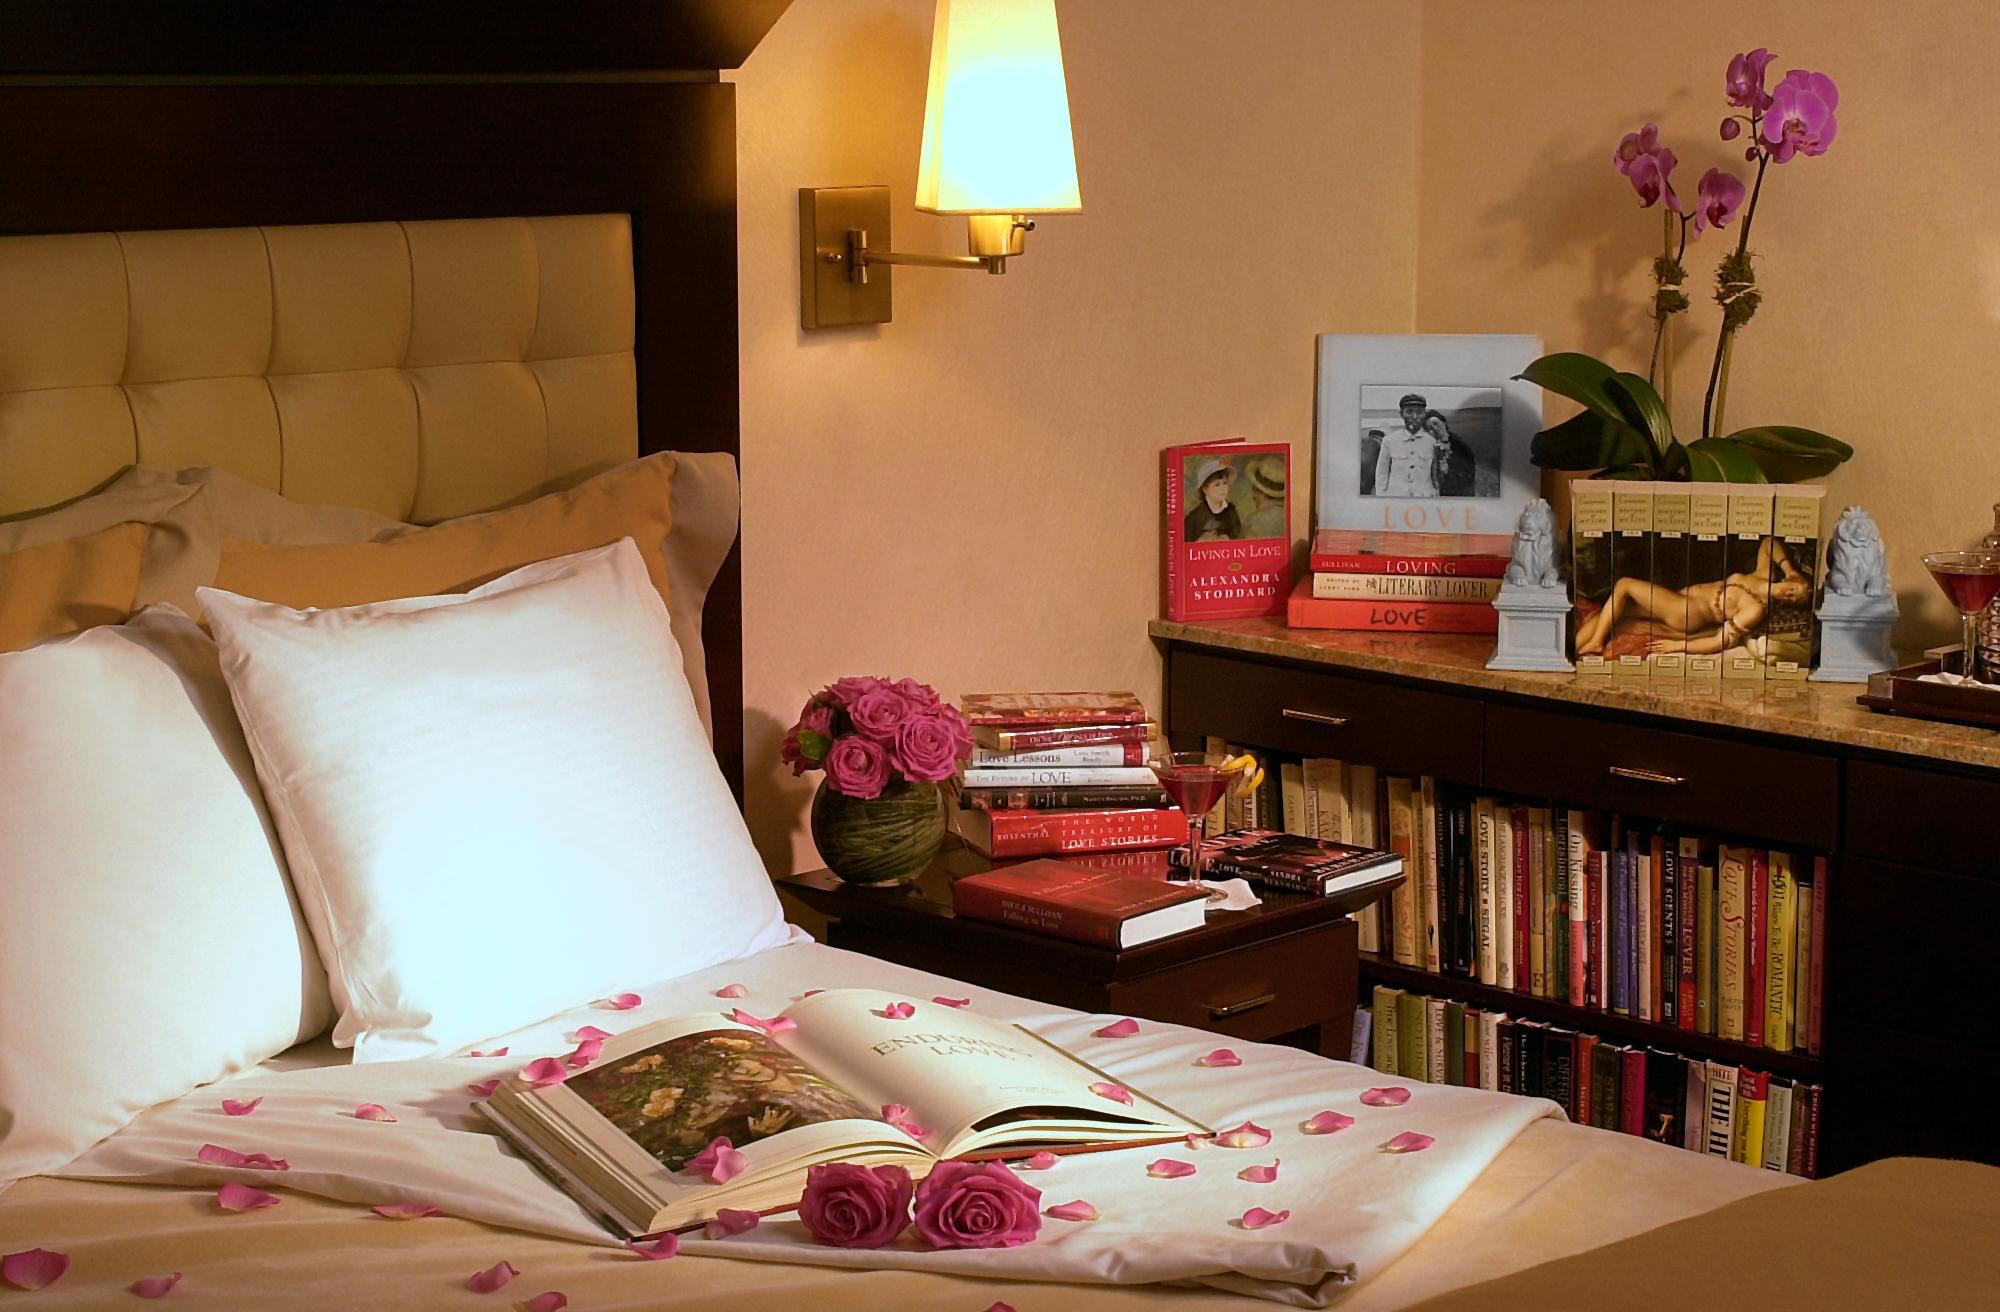 library hotel, en pleno manhattan